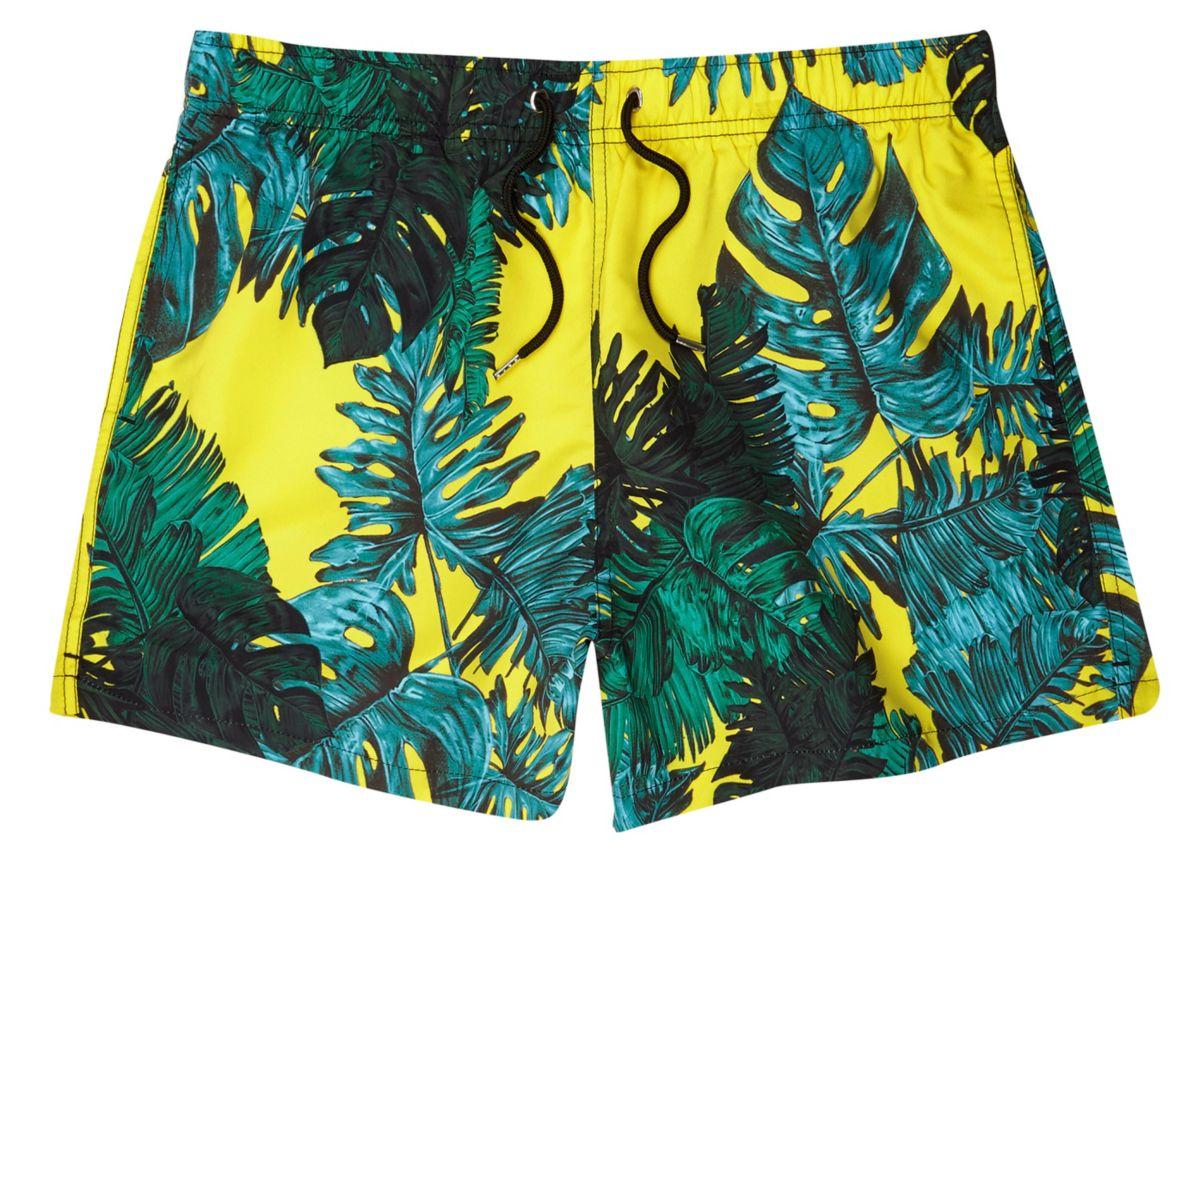 Yellow palm leaf print swim trunks